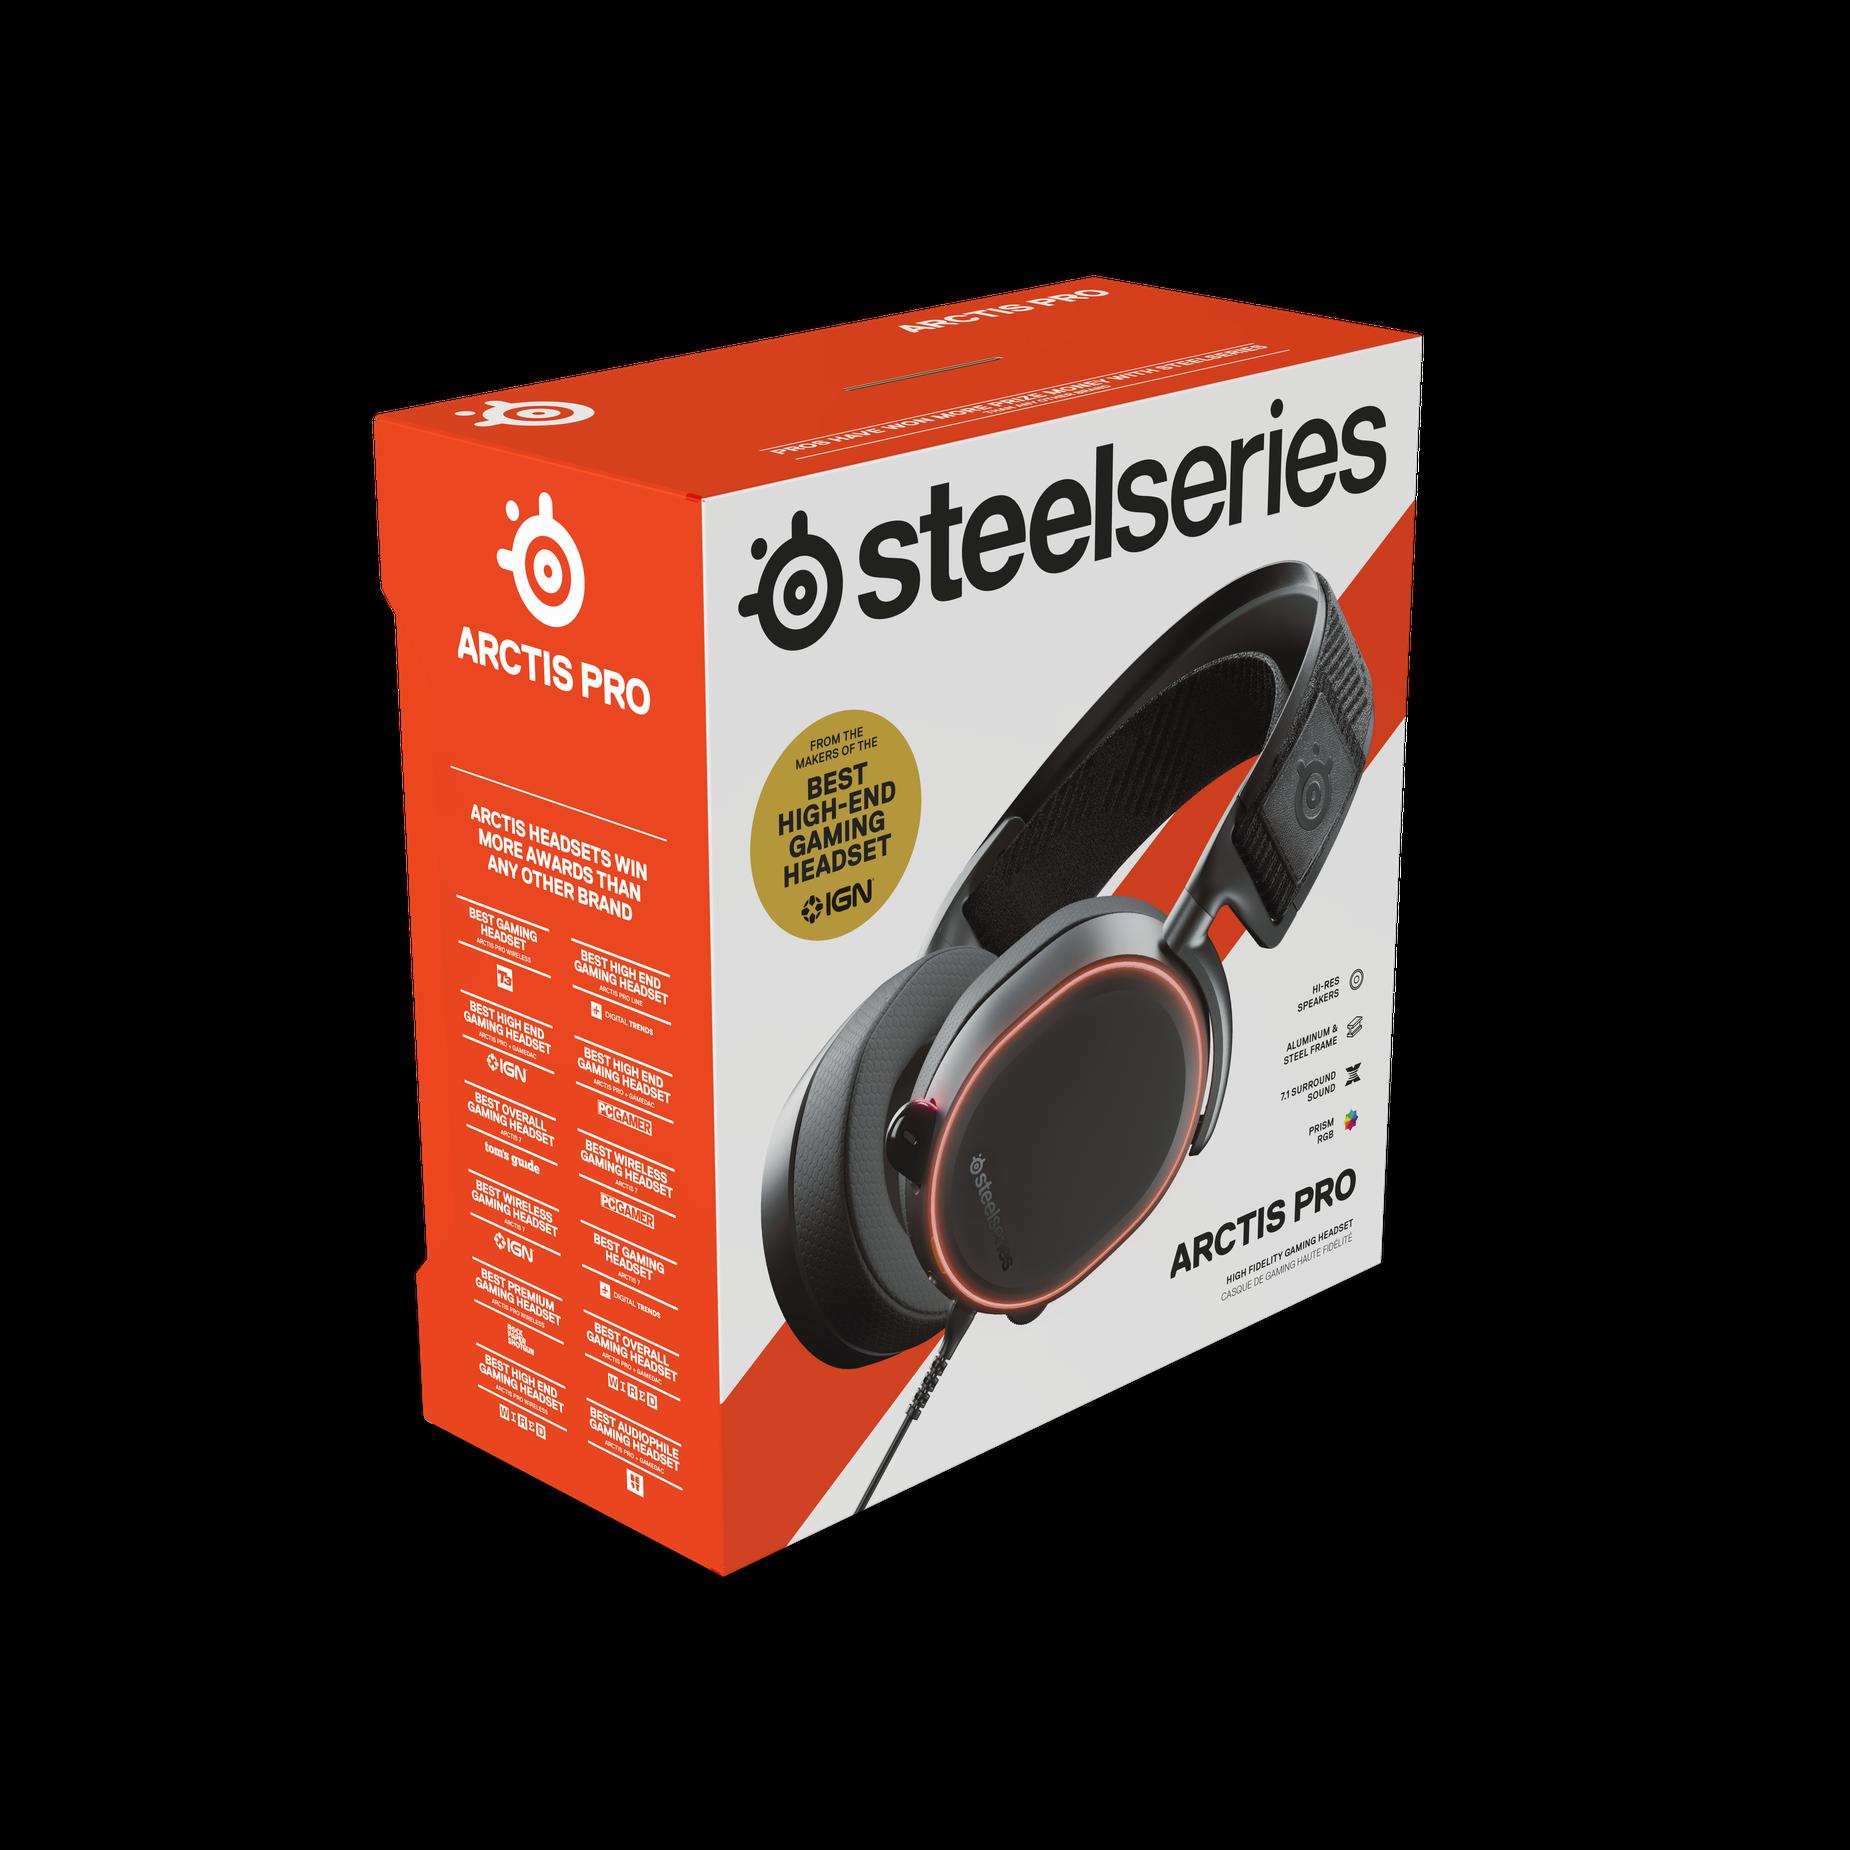 Arctis Pro 耳機外包裝盒。